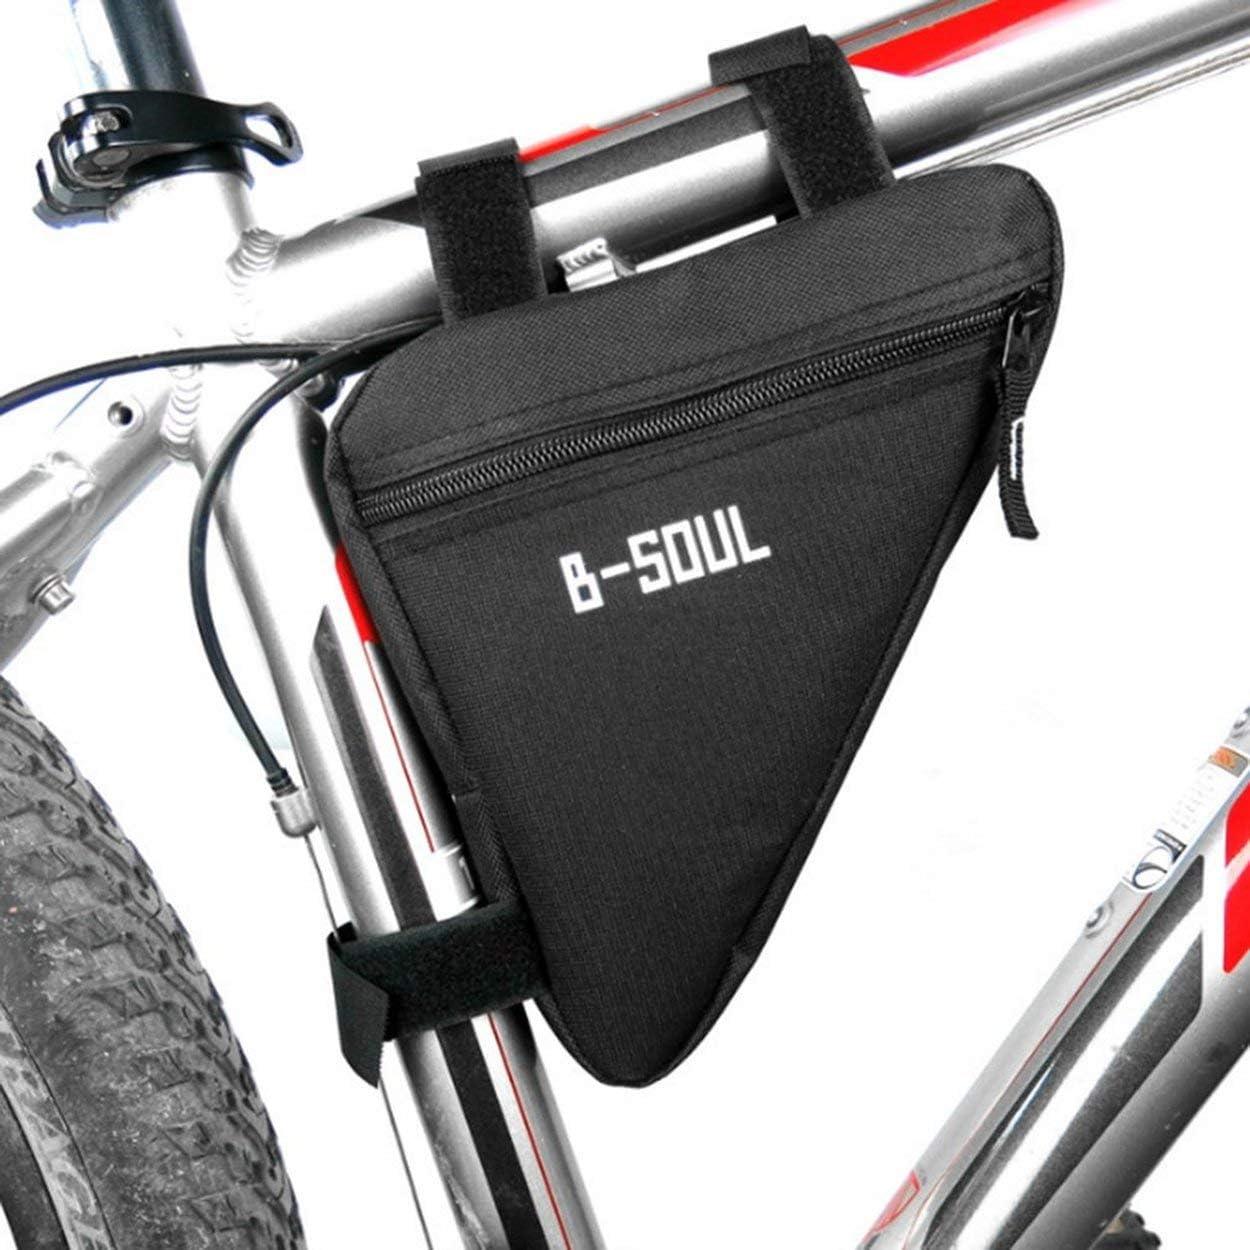 Lorenlli Fit B-Soul Impermeable Triángulo Ciclismo Bolsas de Bicicleta Tubo Delantero Bolsa Marco Porta Bicicleta Sillín Bolsa Manillar Bicicleta Accesorios: Amazon.es: Deportes y aire libre